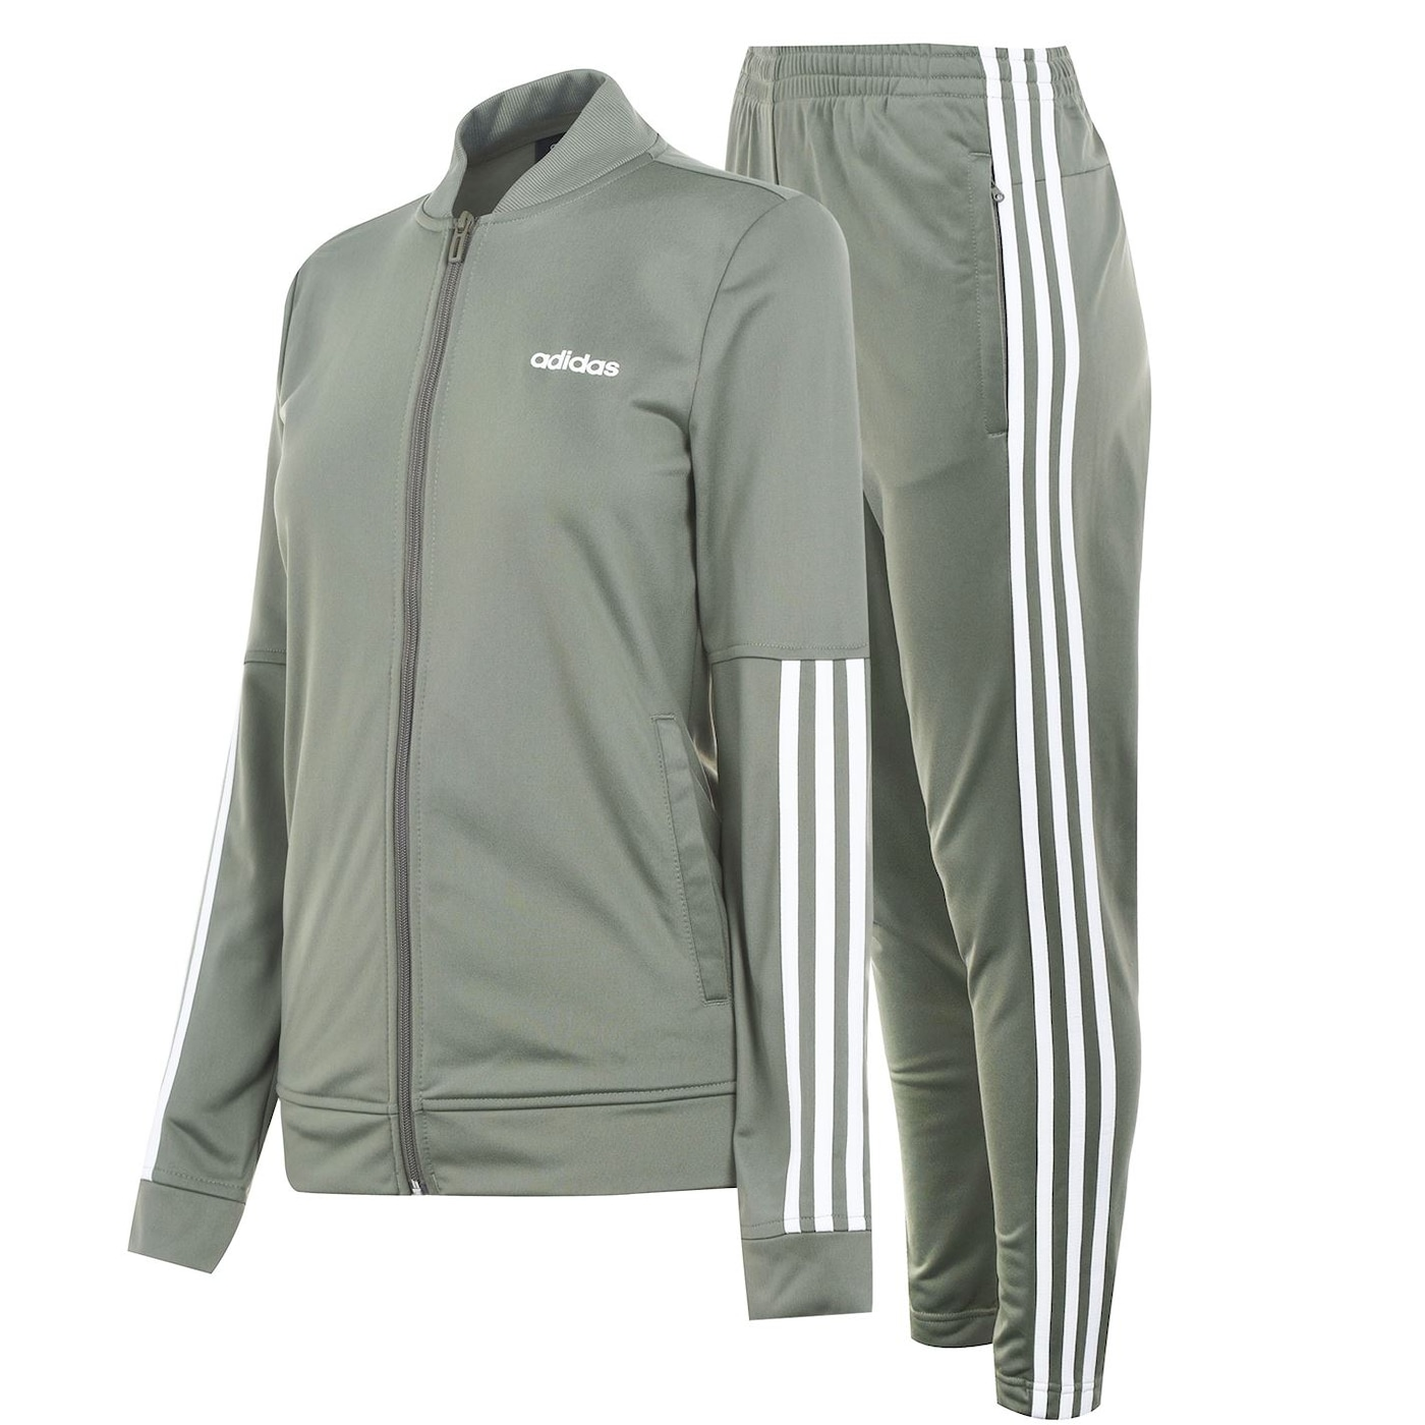 Dámska tepláková súprava Adidas Back 2 Basics